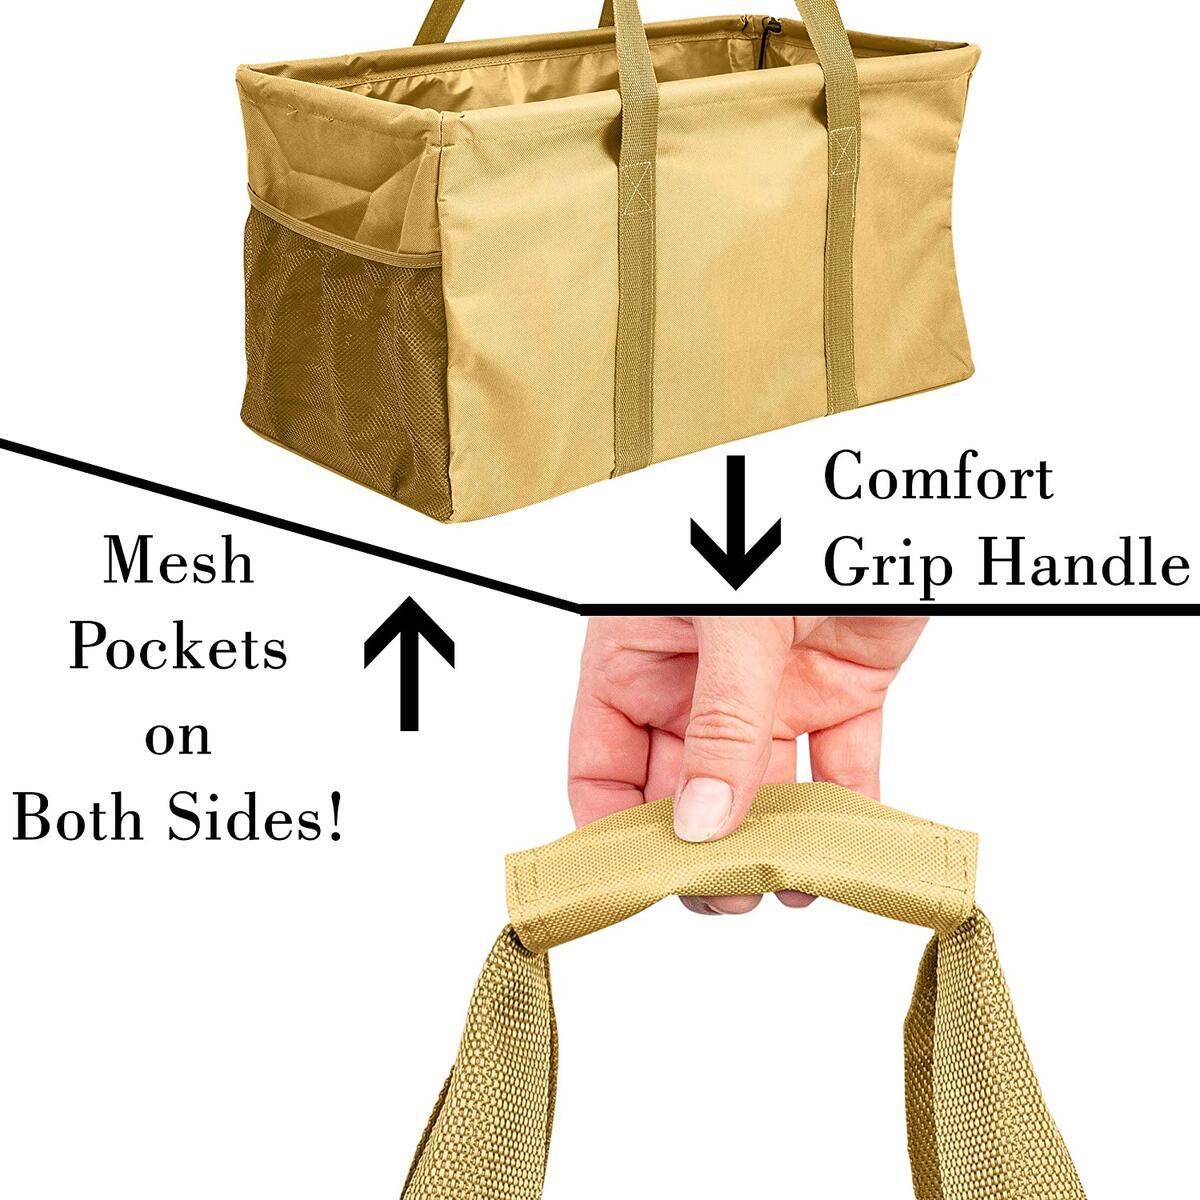 Extra Large Utility Tote Bag - Khaki